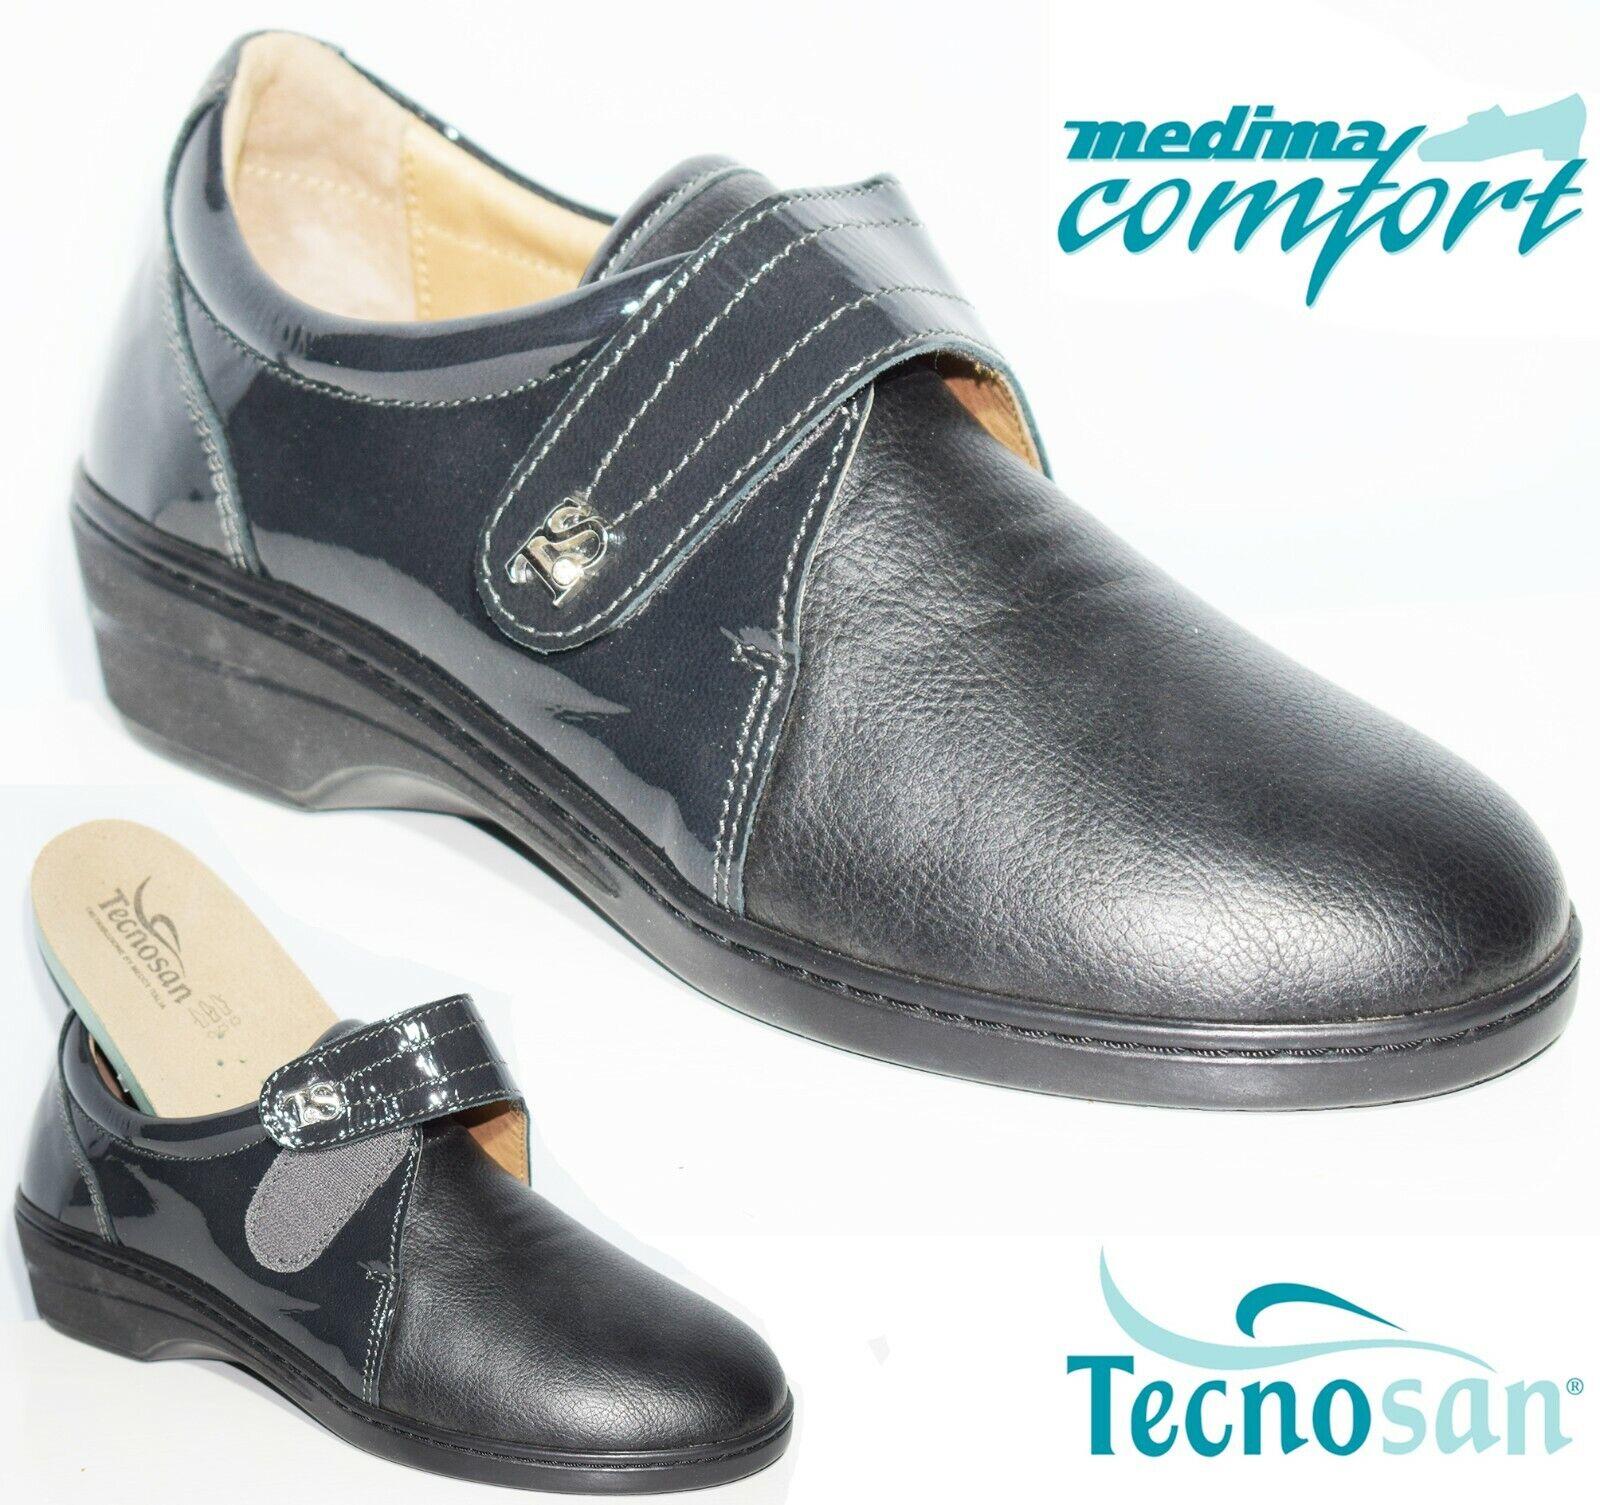 Calzature Health Comfortable Summer Shoes Orthotic Comfort Woman Hallux Valgus